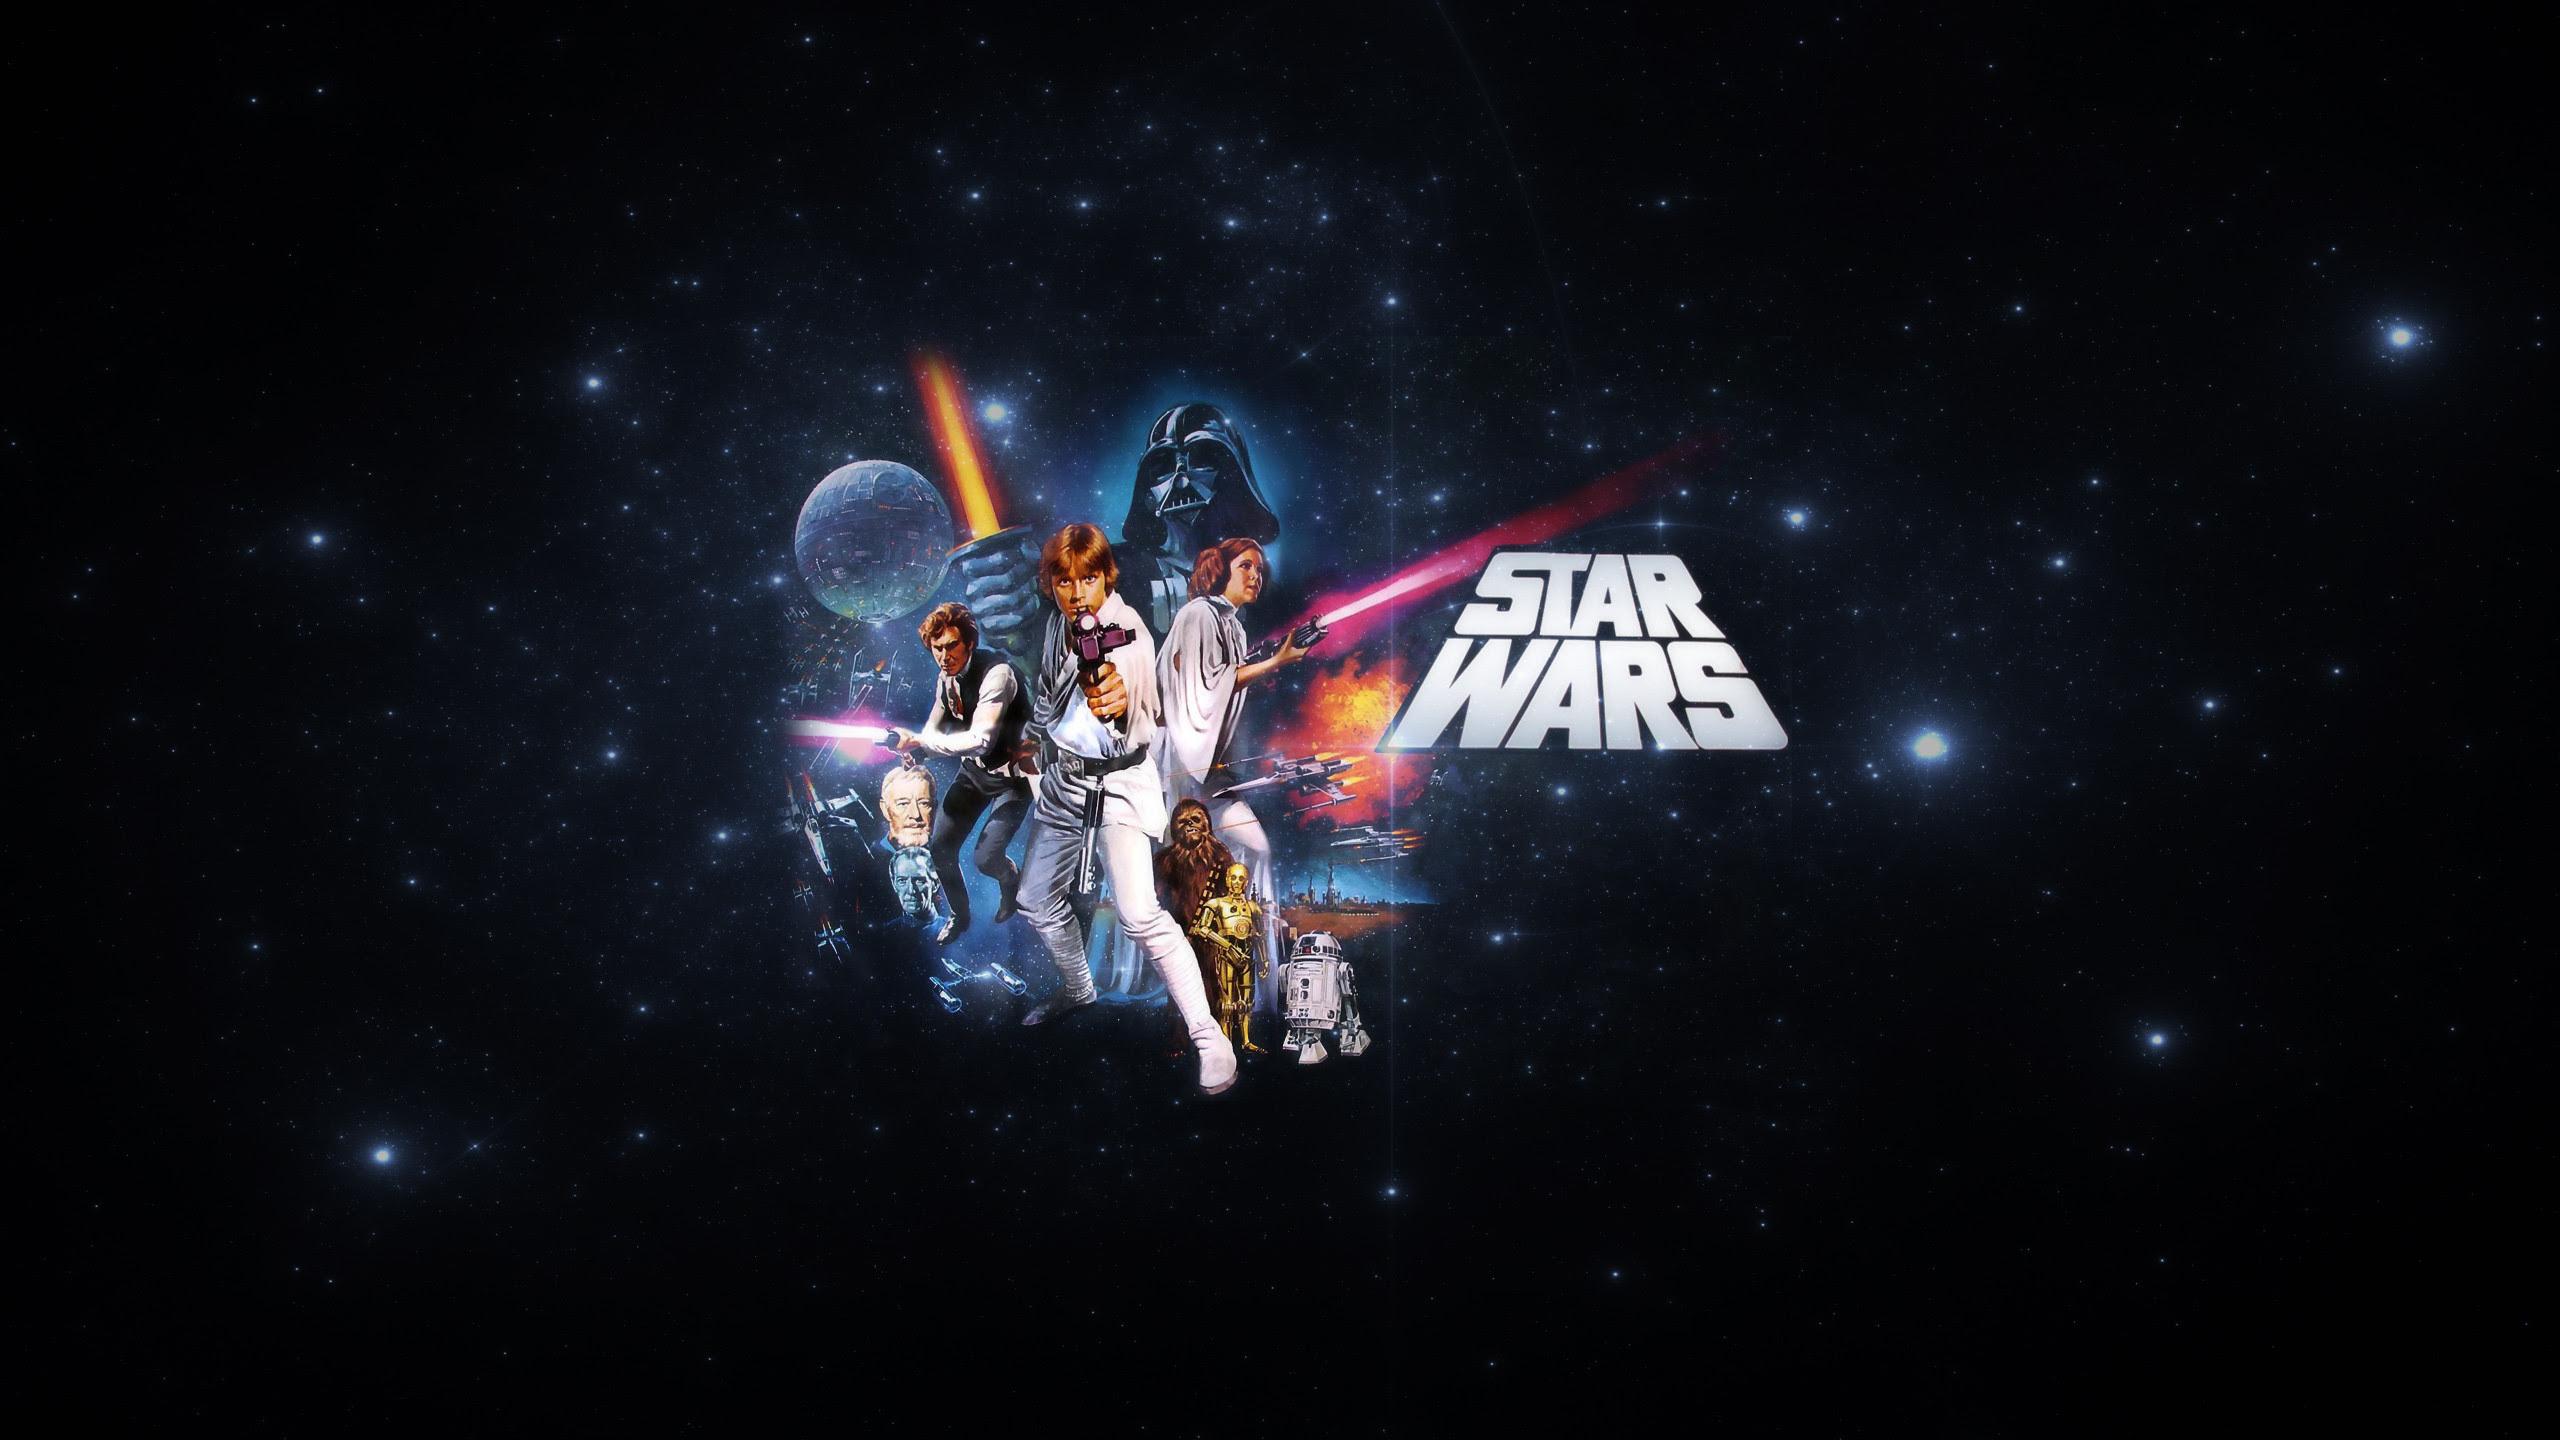 Desktop Background Star Wars Wallpaper Singebloggg